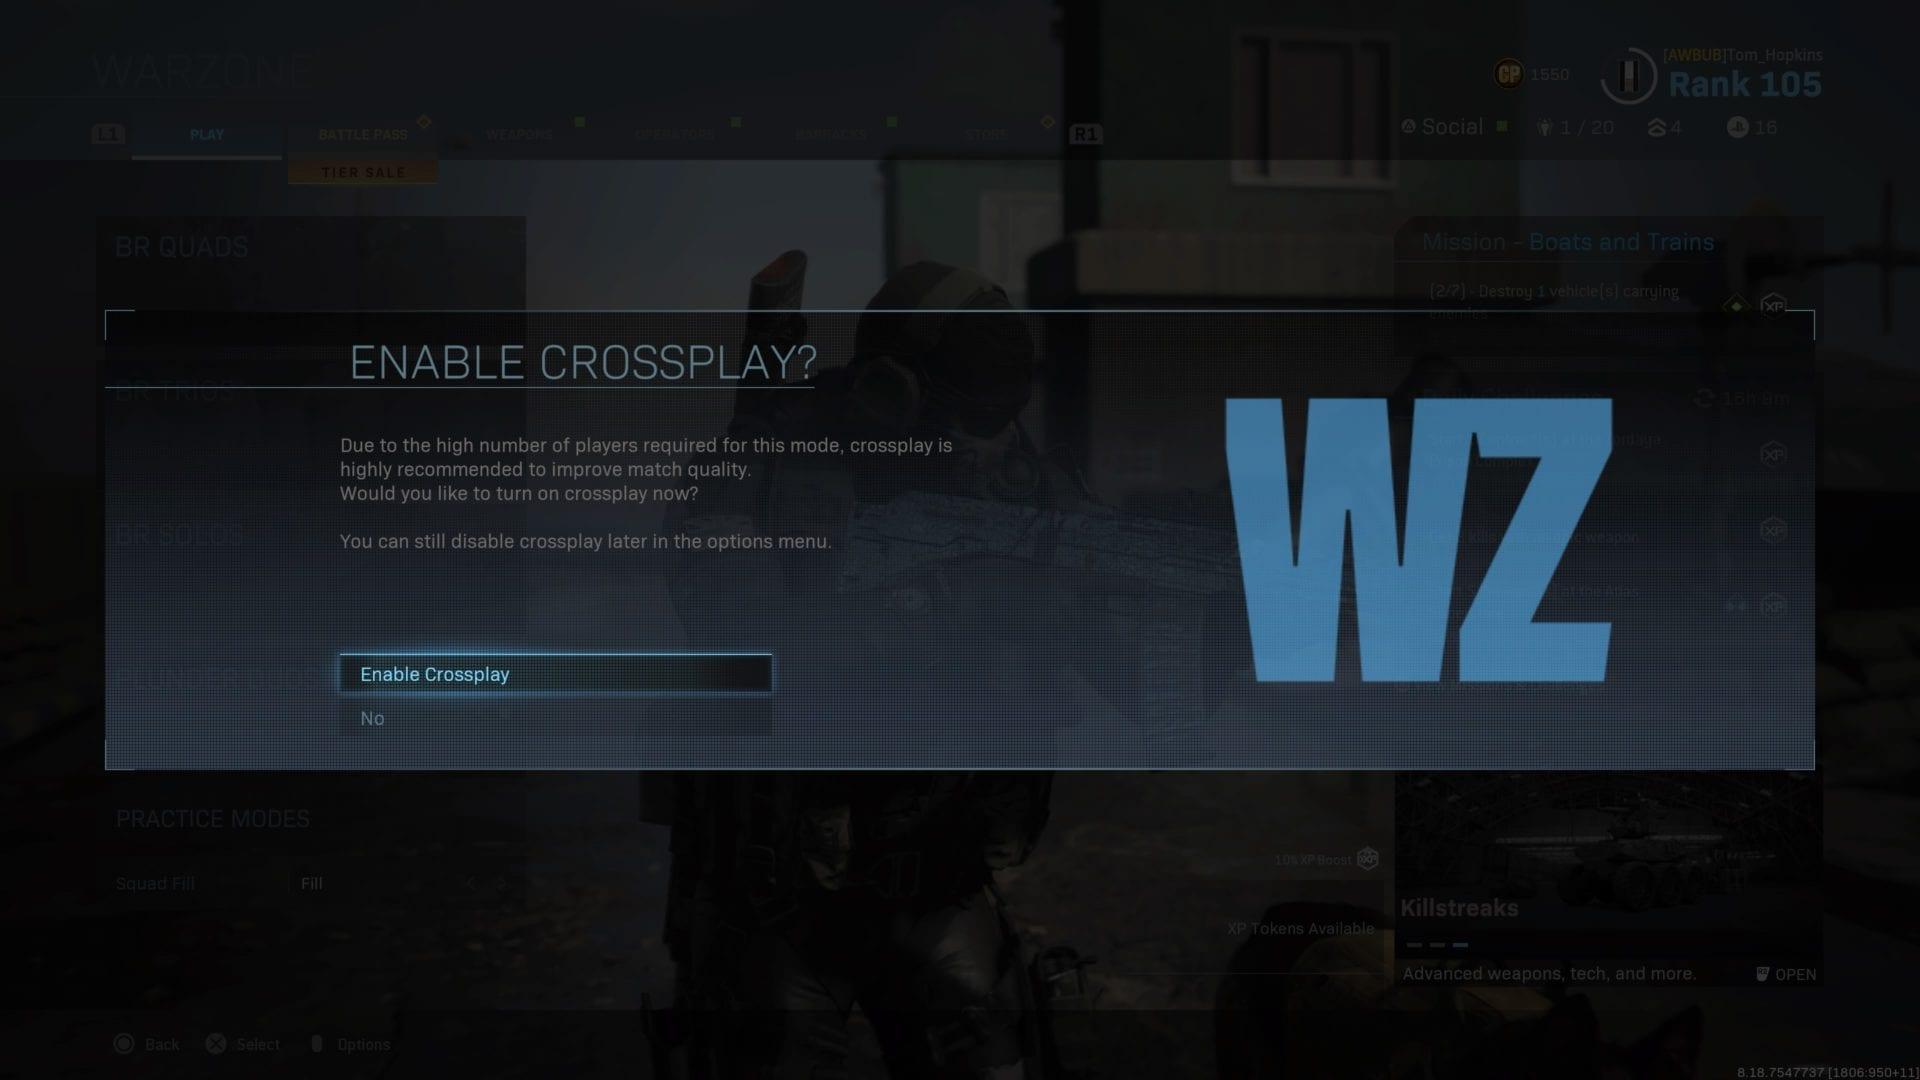 zona de guerra, deshabilitar crossplay